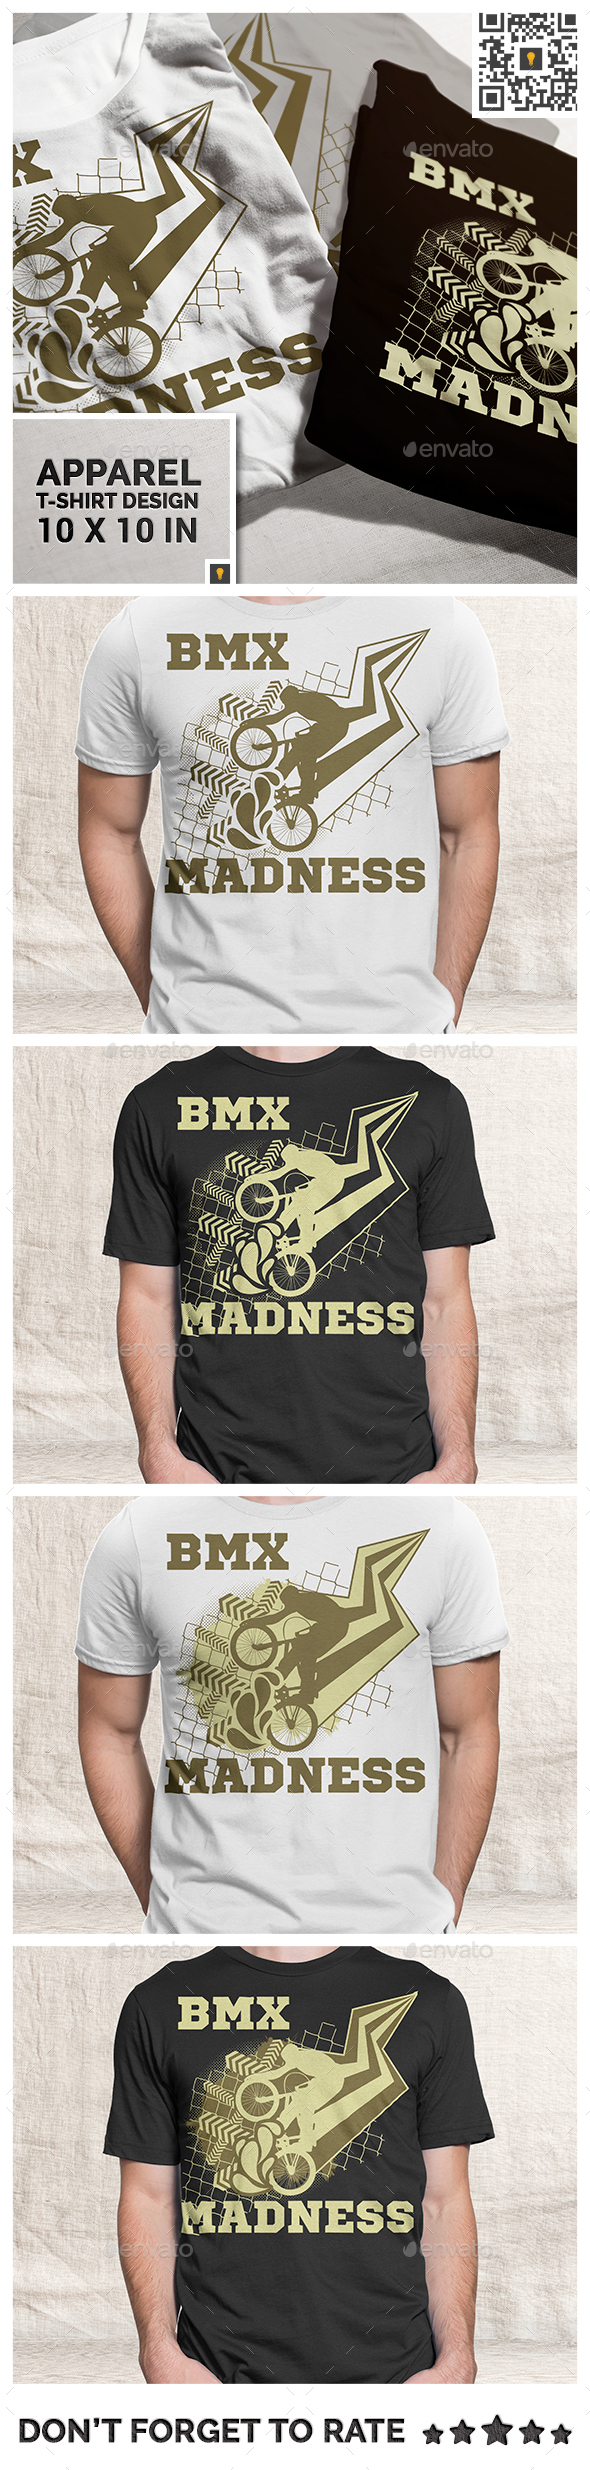 BMX Madness Theme T-shirt Design - Sports & Teams T-Shirts